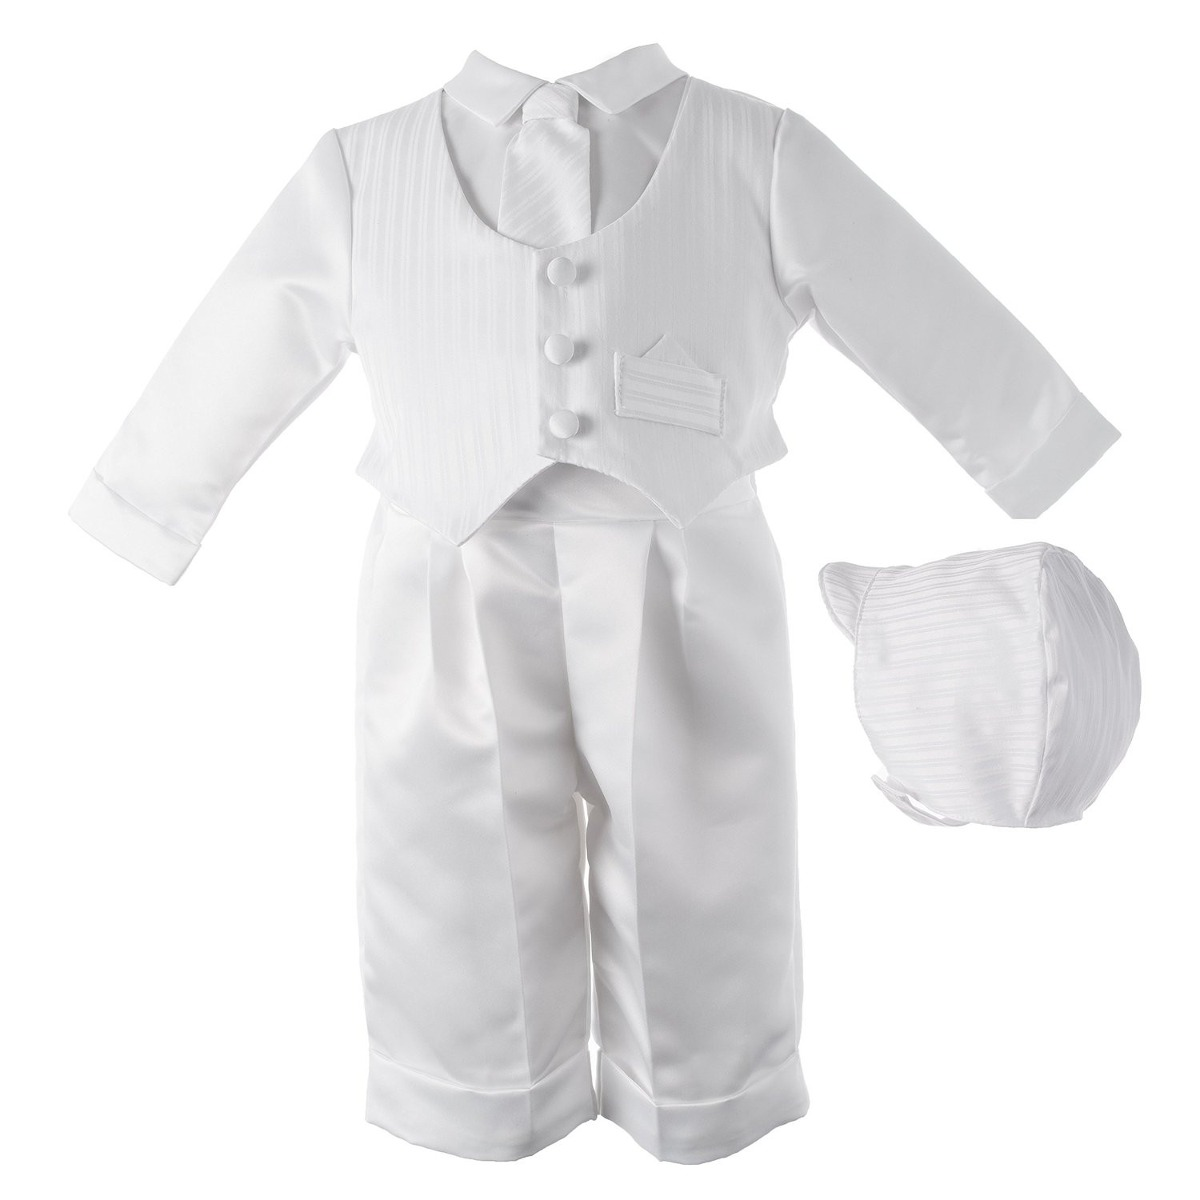 dd05487e0 Traje Niño Infantil Bautizo Blanco Ropa Edad 6 A 9 Meses -   456.110 ...